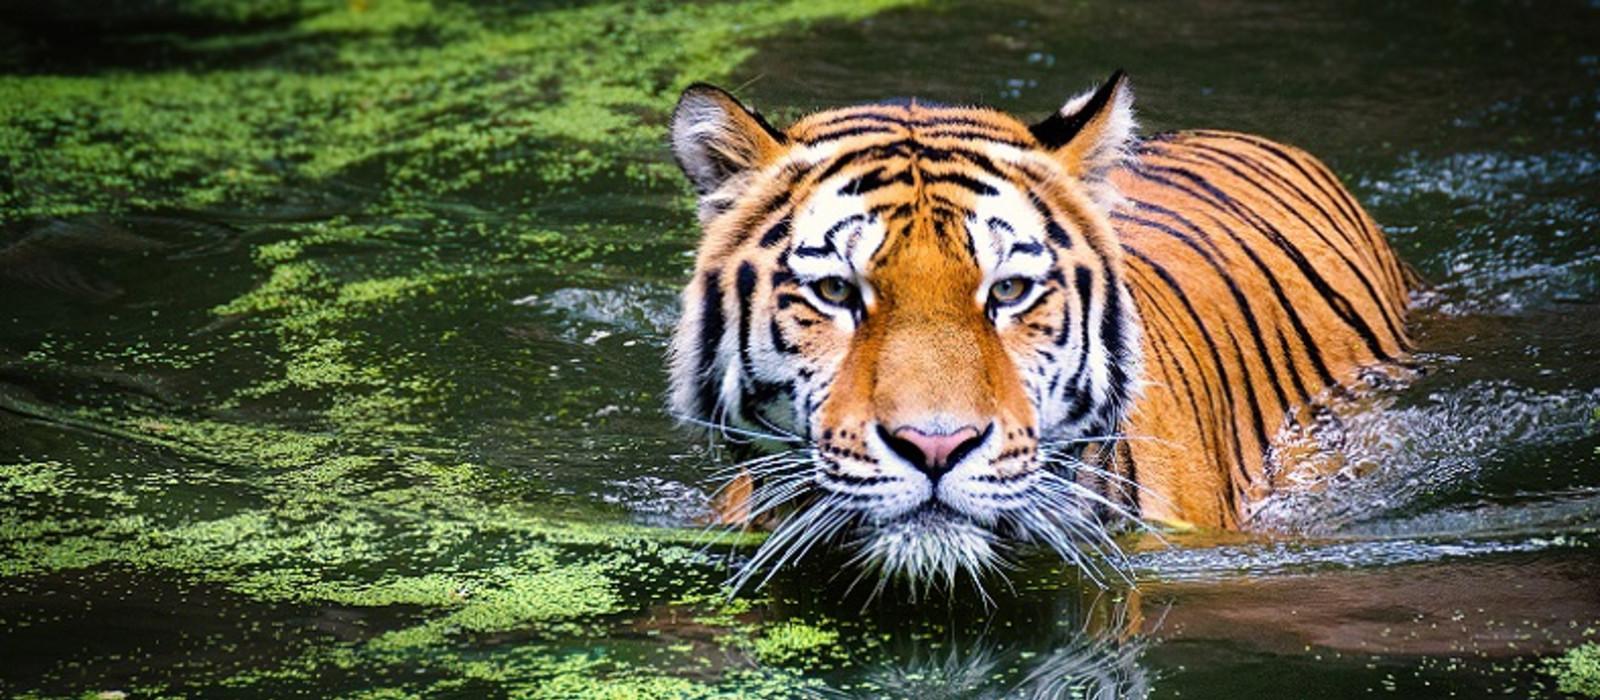 Gujarat and Rajasthan: Heritage and Wildlife Tour Trip 1